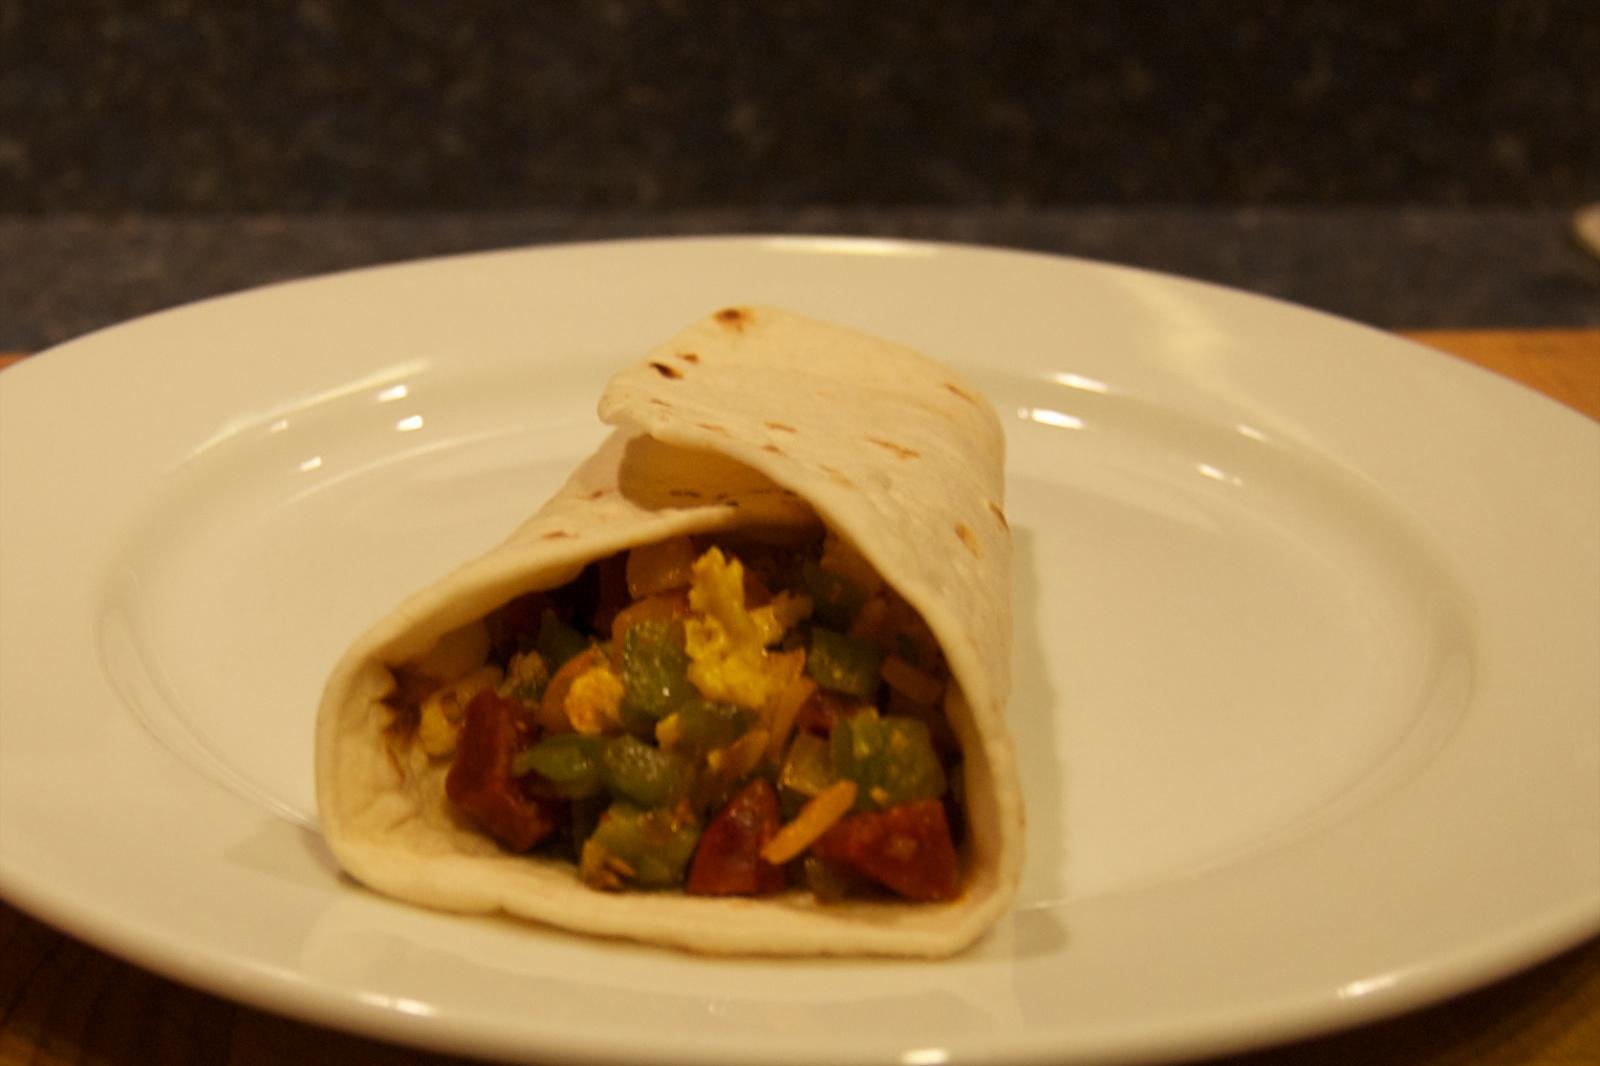 http://blog.rickk.com/food/2011/12/20/ate.2011.12.20.b.jpg